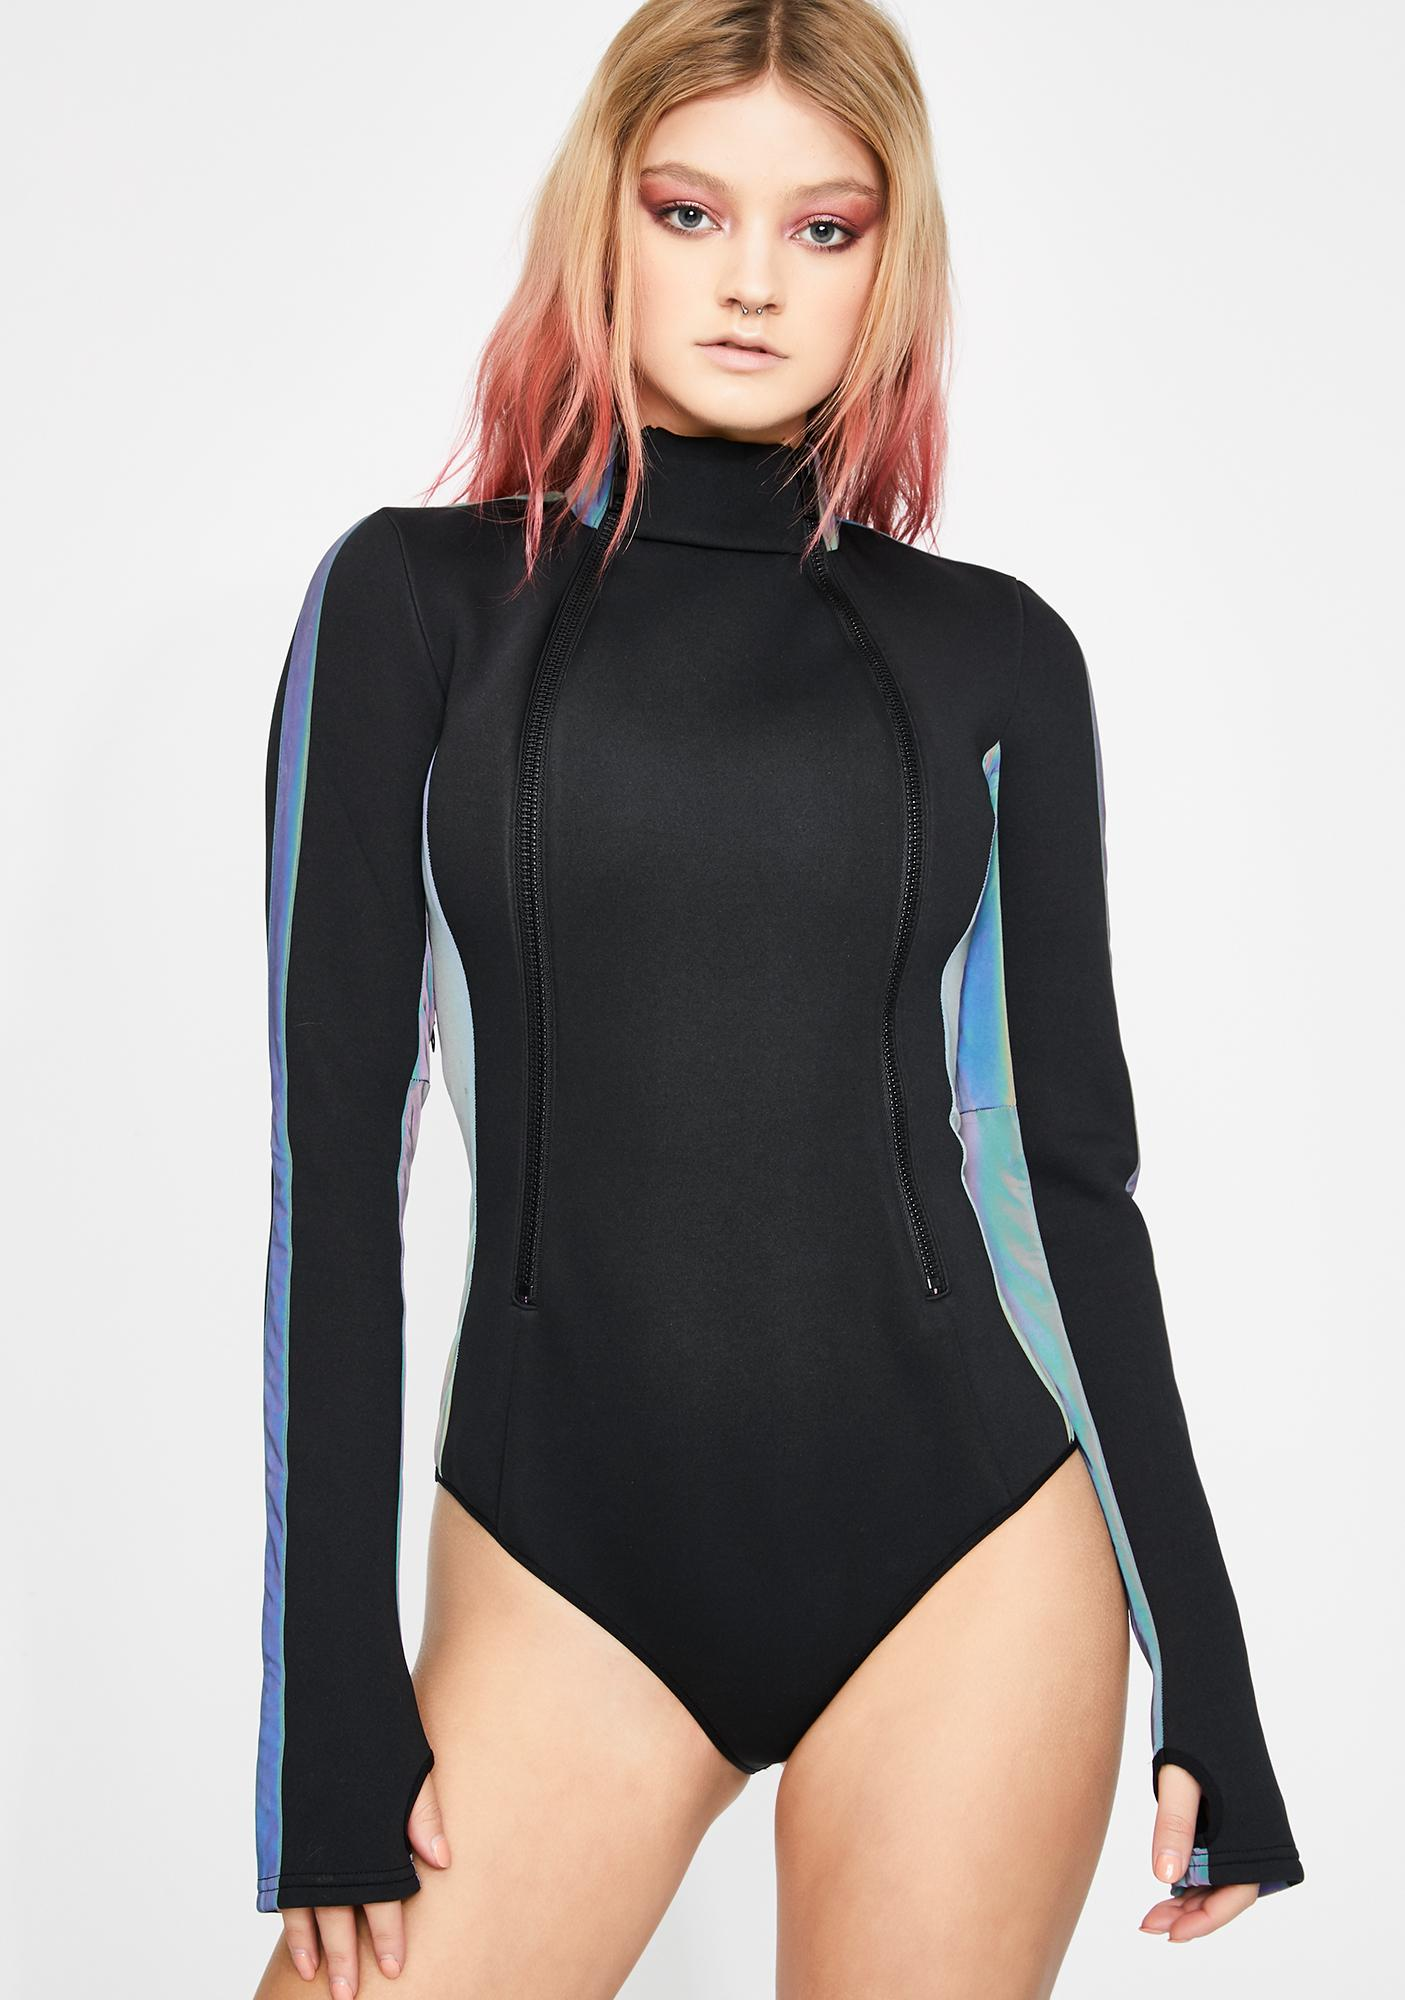 Club Exx Prismatic Wonderland Zipper Bodysuit